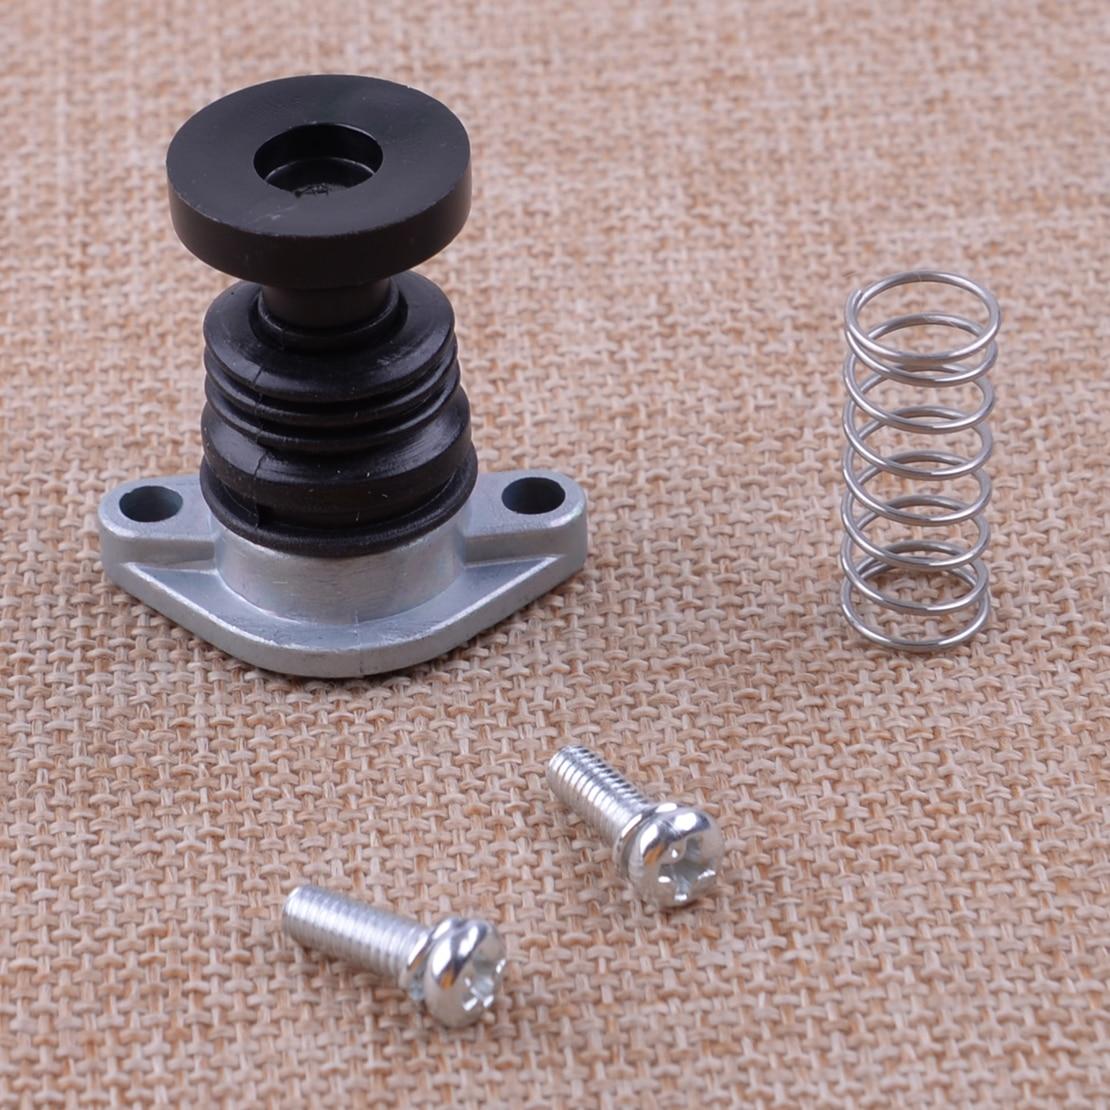 CITALL 4pcs Carb Carburetor Primer Pump Screw Spring Kit Fit For Honda ATV TRX300 TRX350 TRX500 TRX450